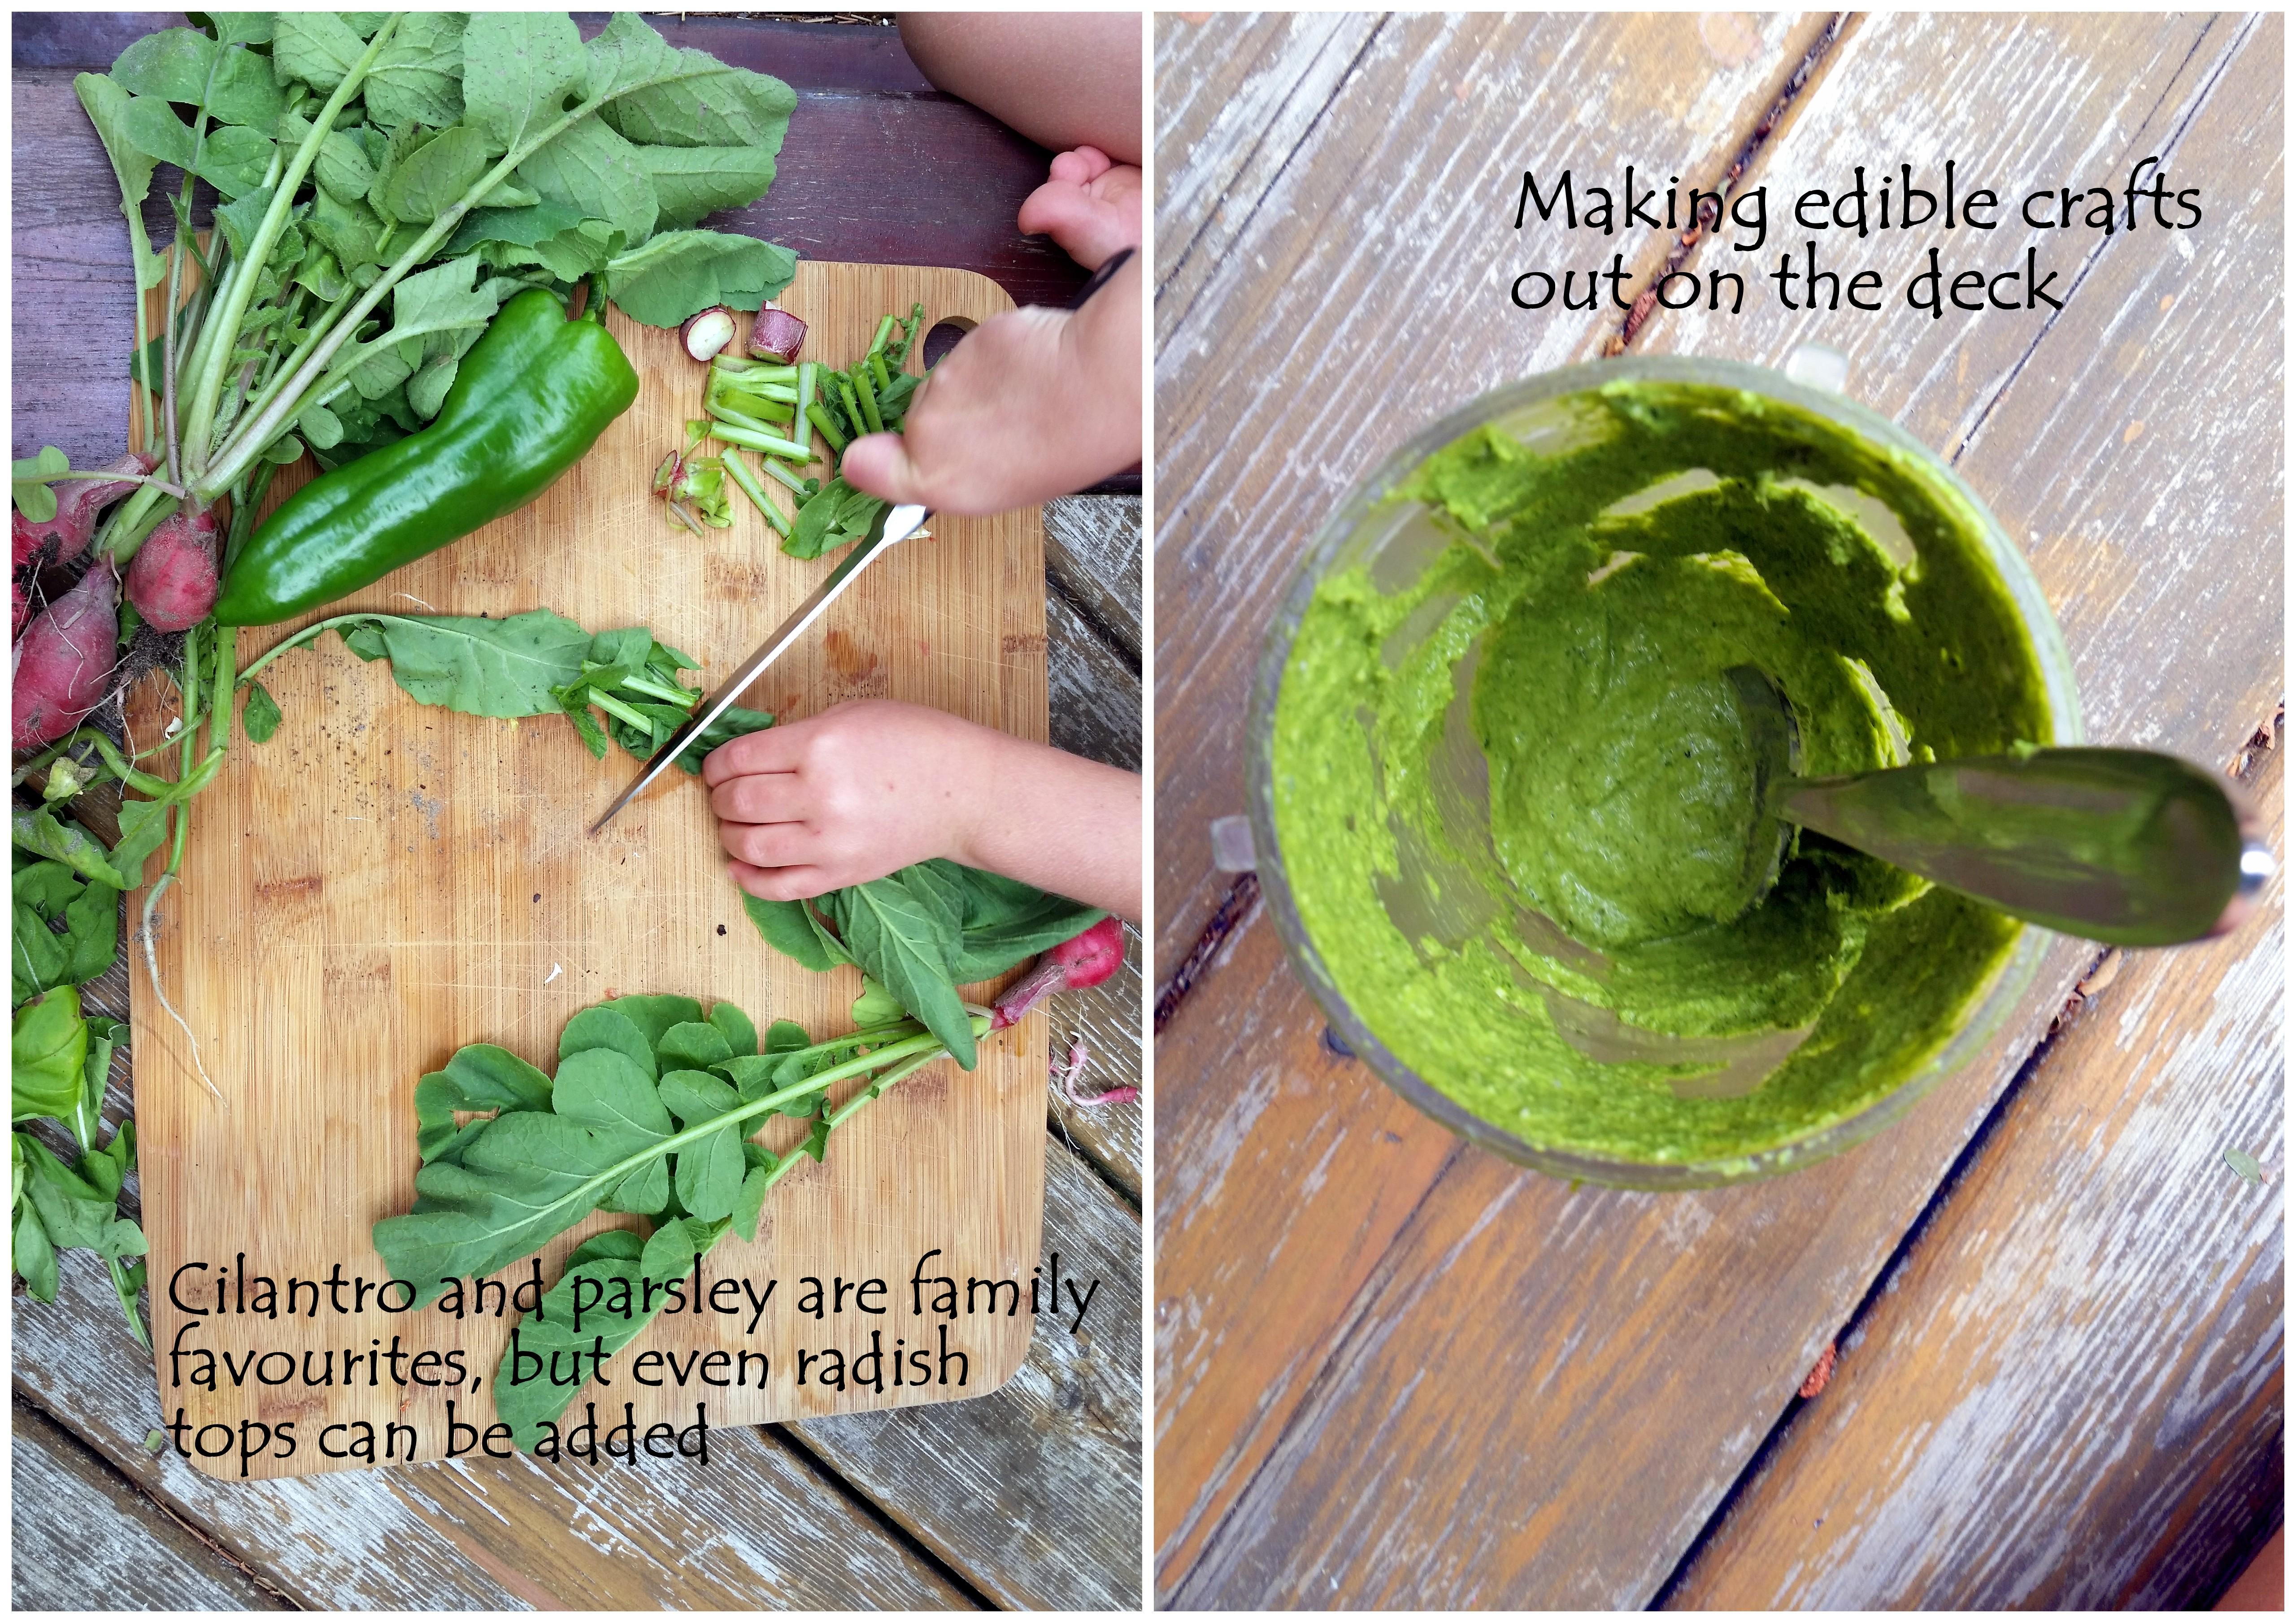 greens cilantro hemp seeds garden kids cooking recipe loven life healthy eating edible crafts